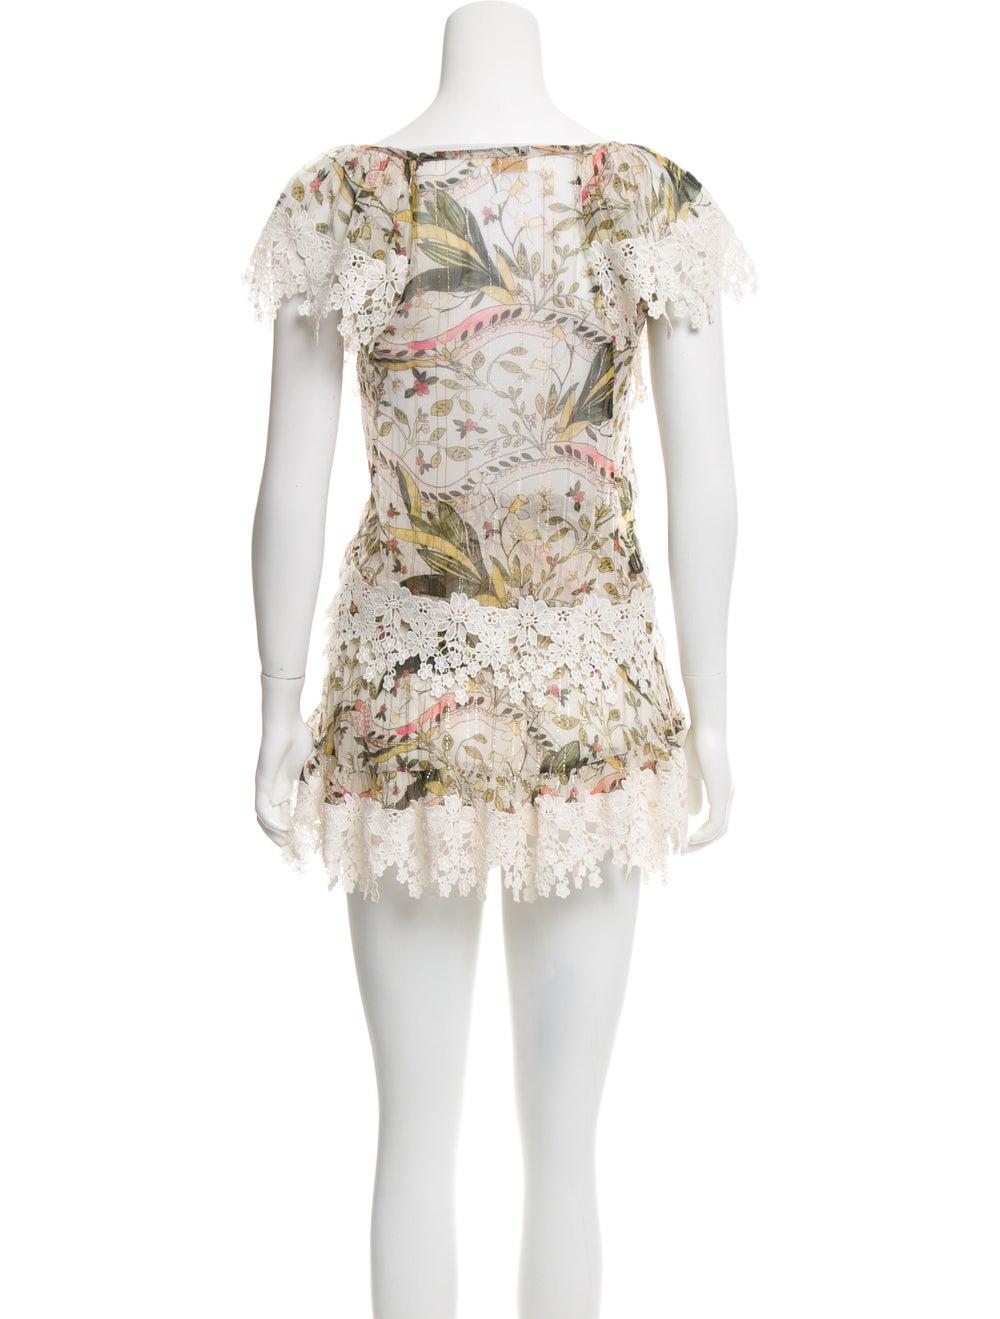 Zimmermann Floral Print Skirt Set - image 3